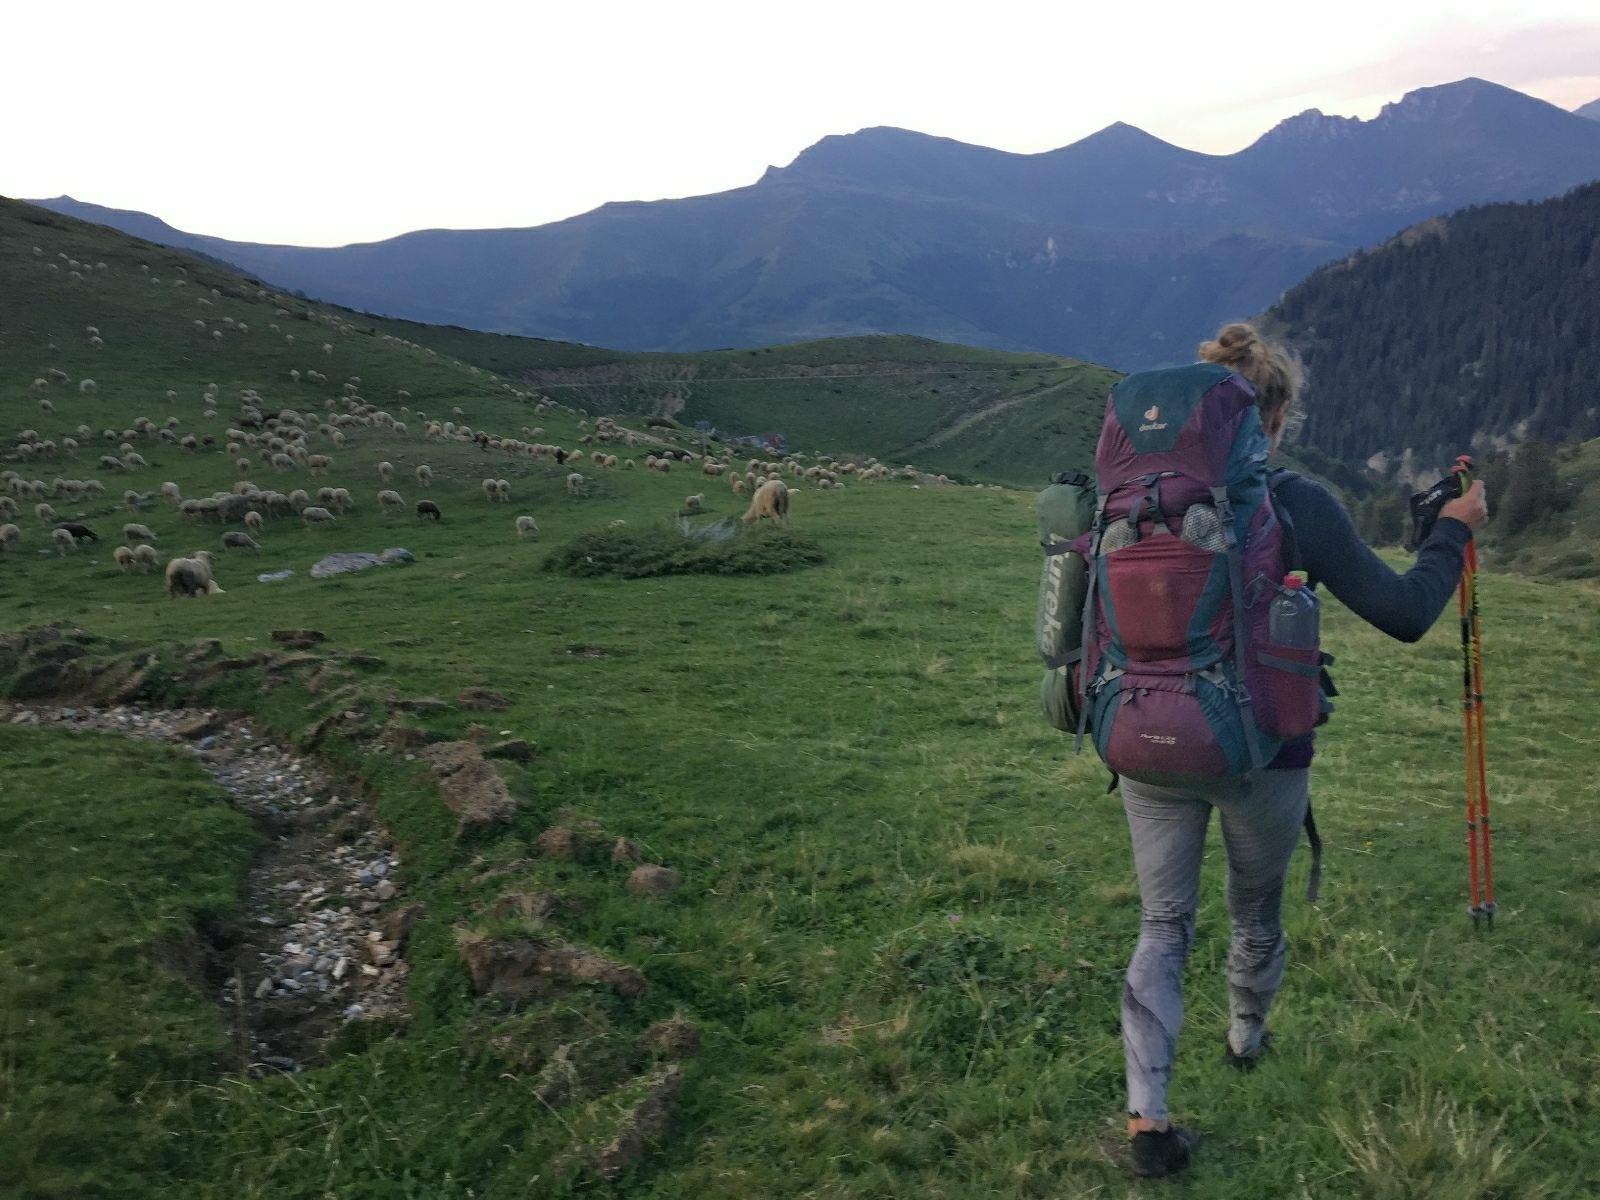 Hiking towards the sheepfold